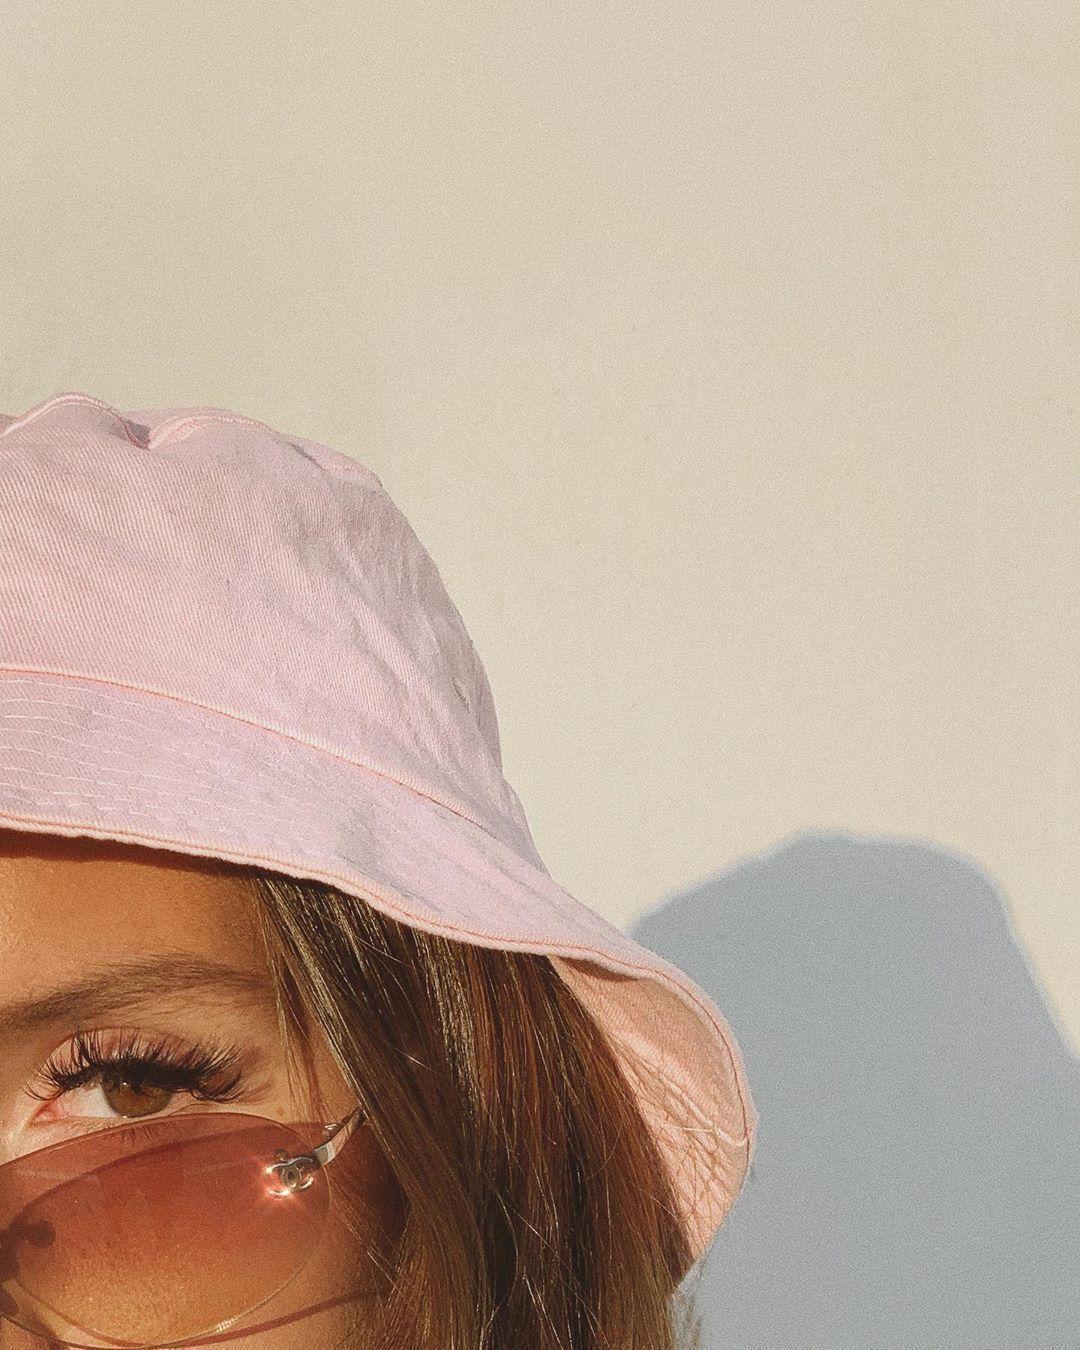 Emma Rose hinaus Instagram: CHANEL OFFICIAL ????????  ???? # fashioninthe9